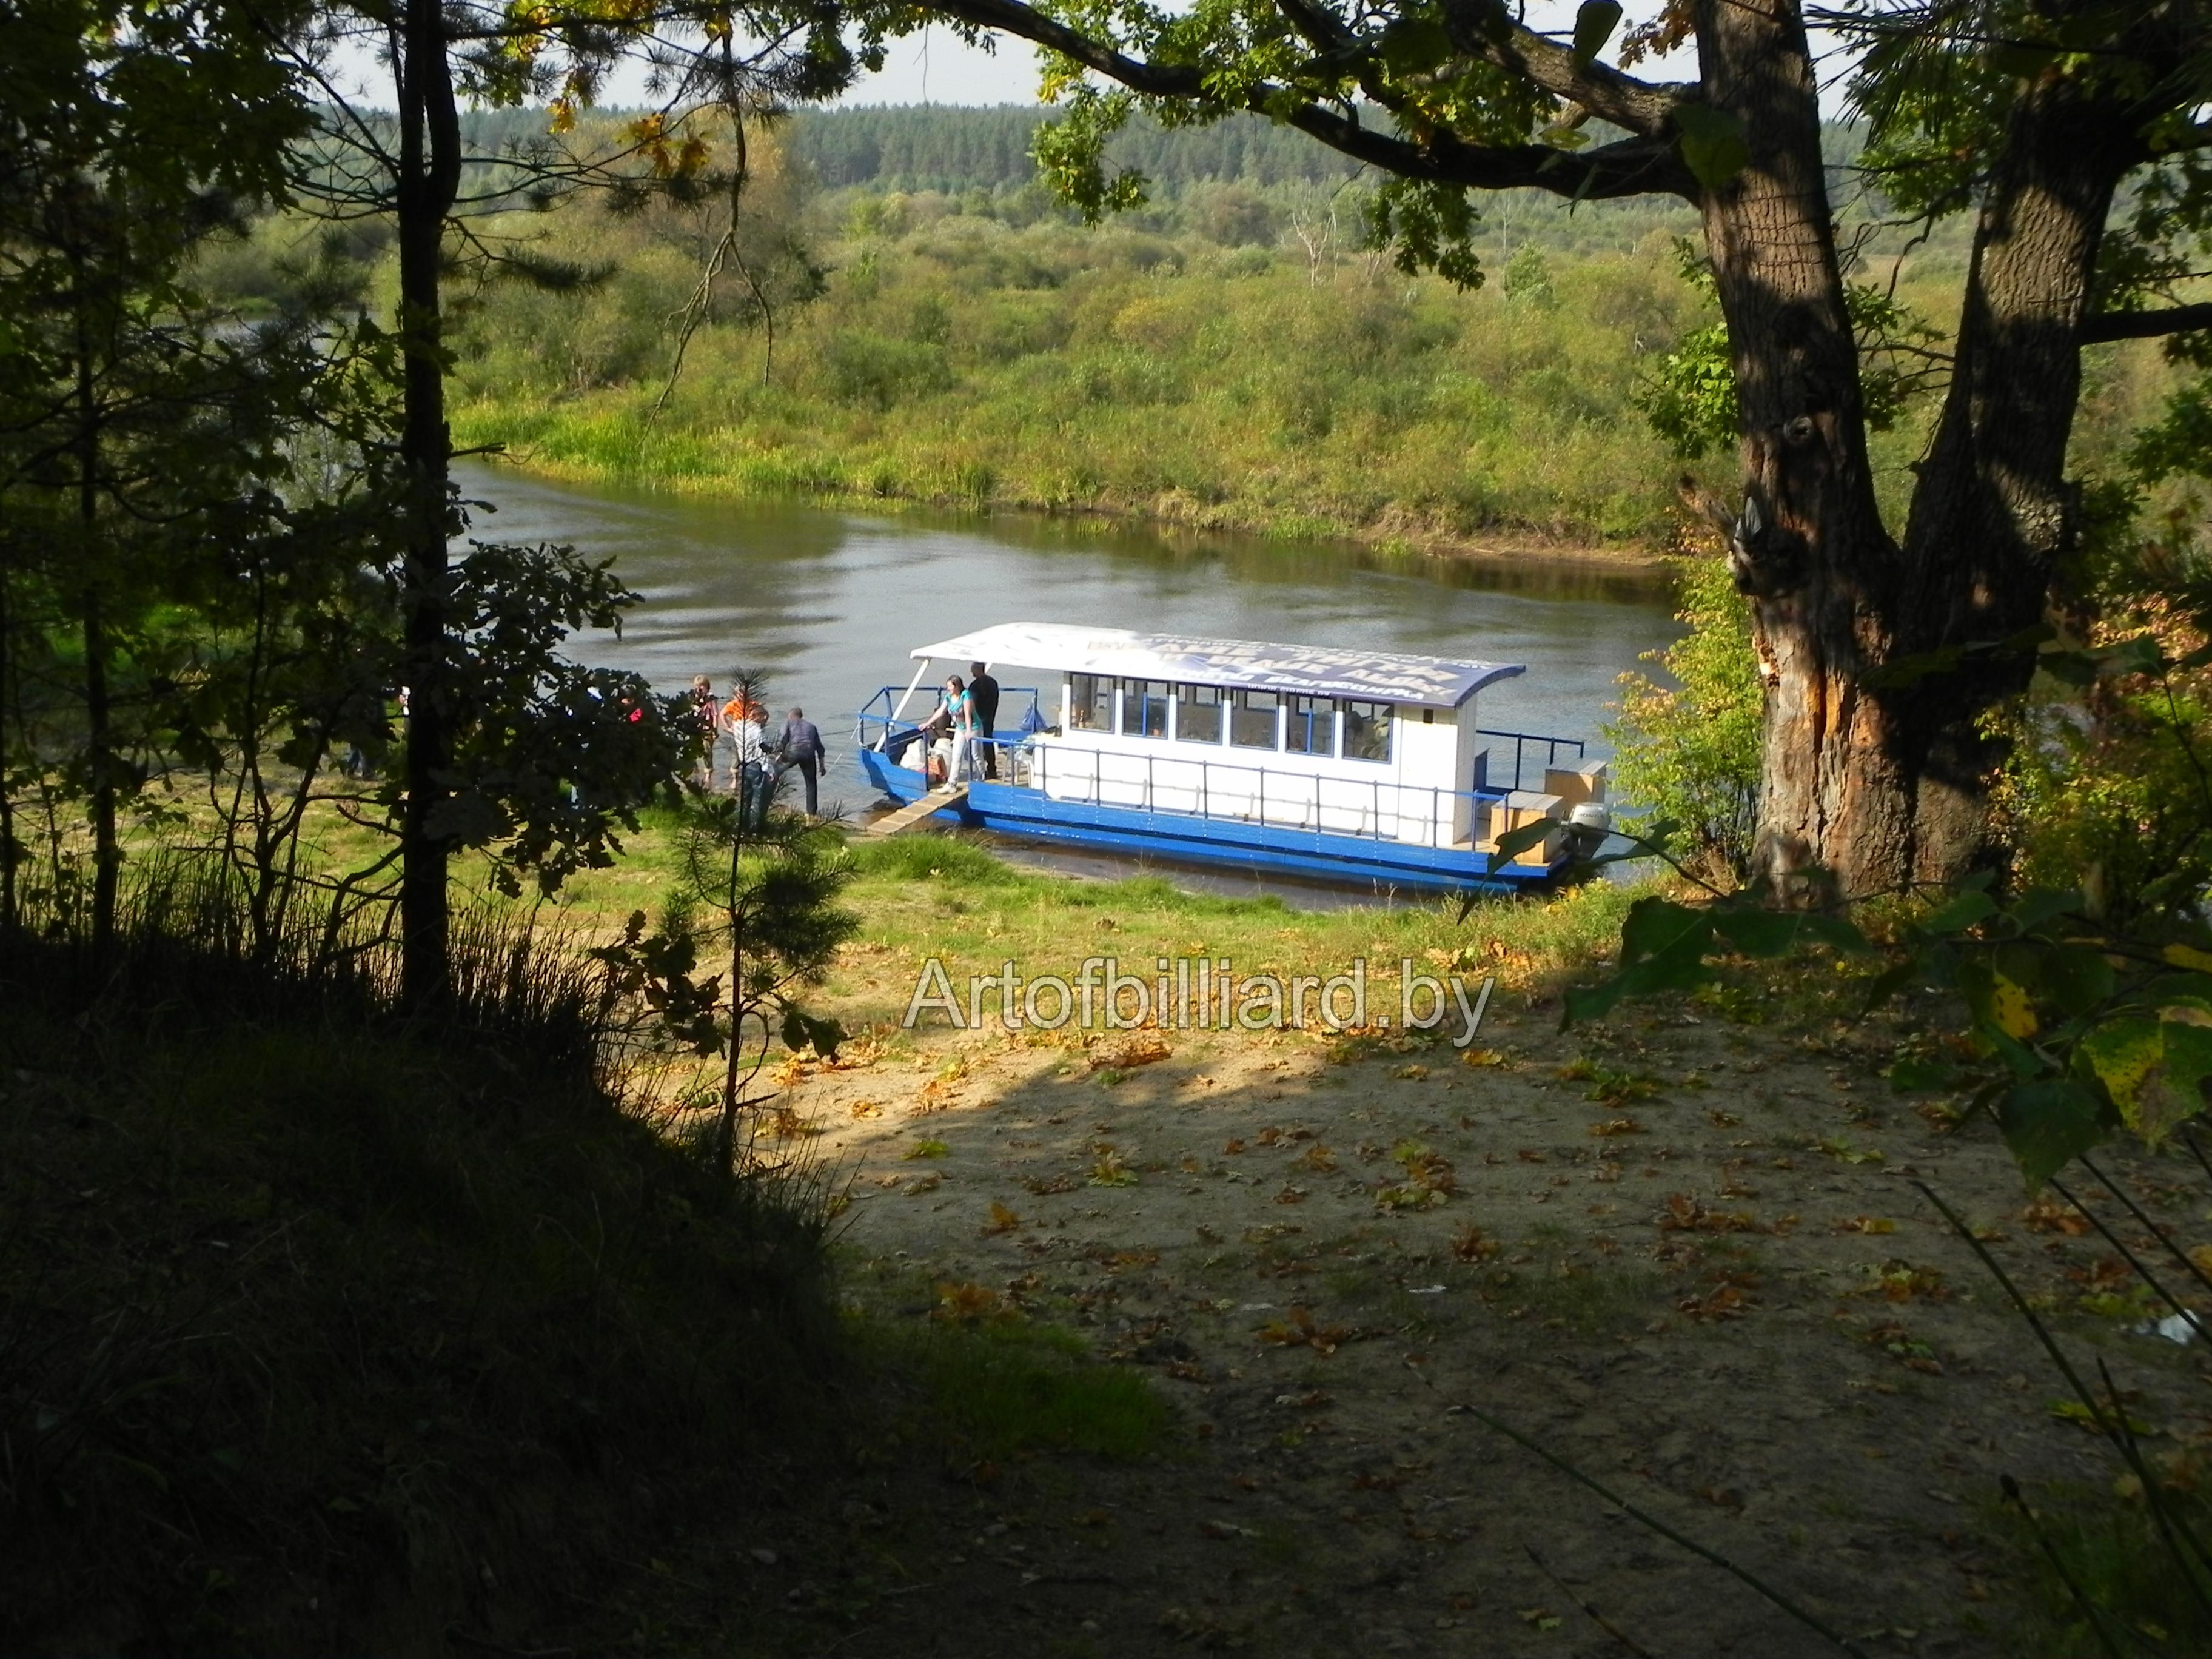 Яхта-катамаран на реке